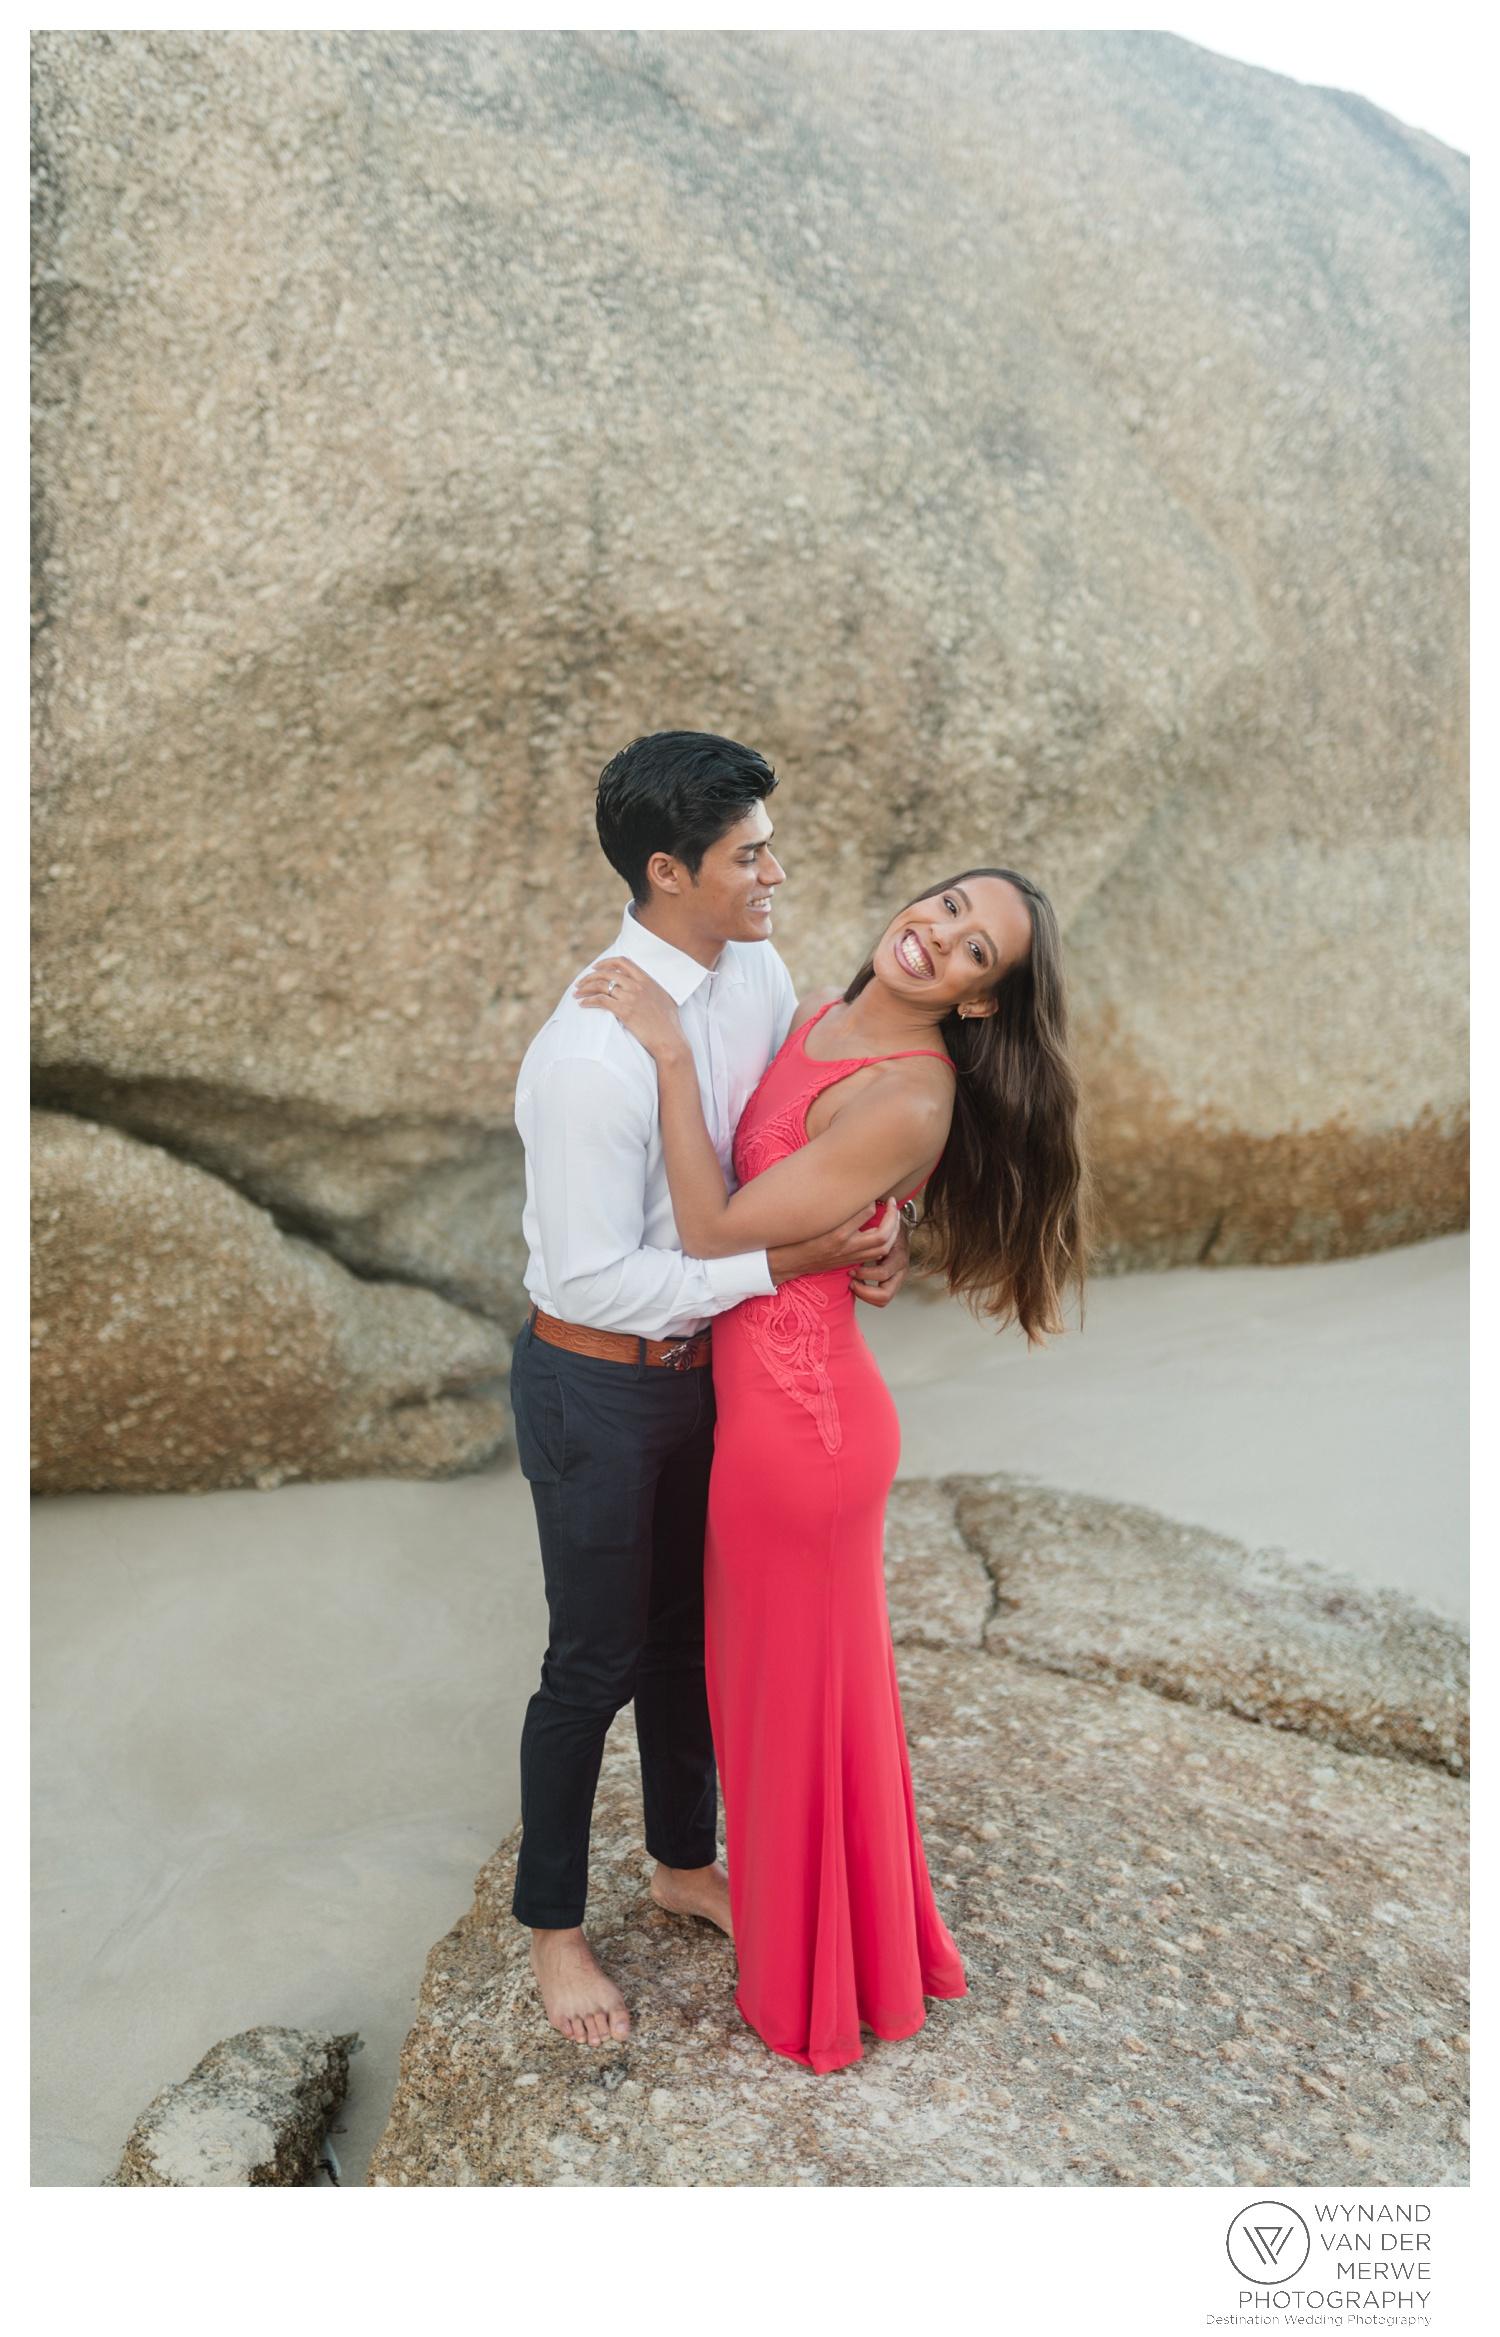 WvdM_engagementshoot_engaged_couple_prewedding_llandudno_cliftonbeach_beach_formal_southafrica_weddingphotographer_greernicolas-26.jpg